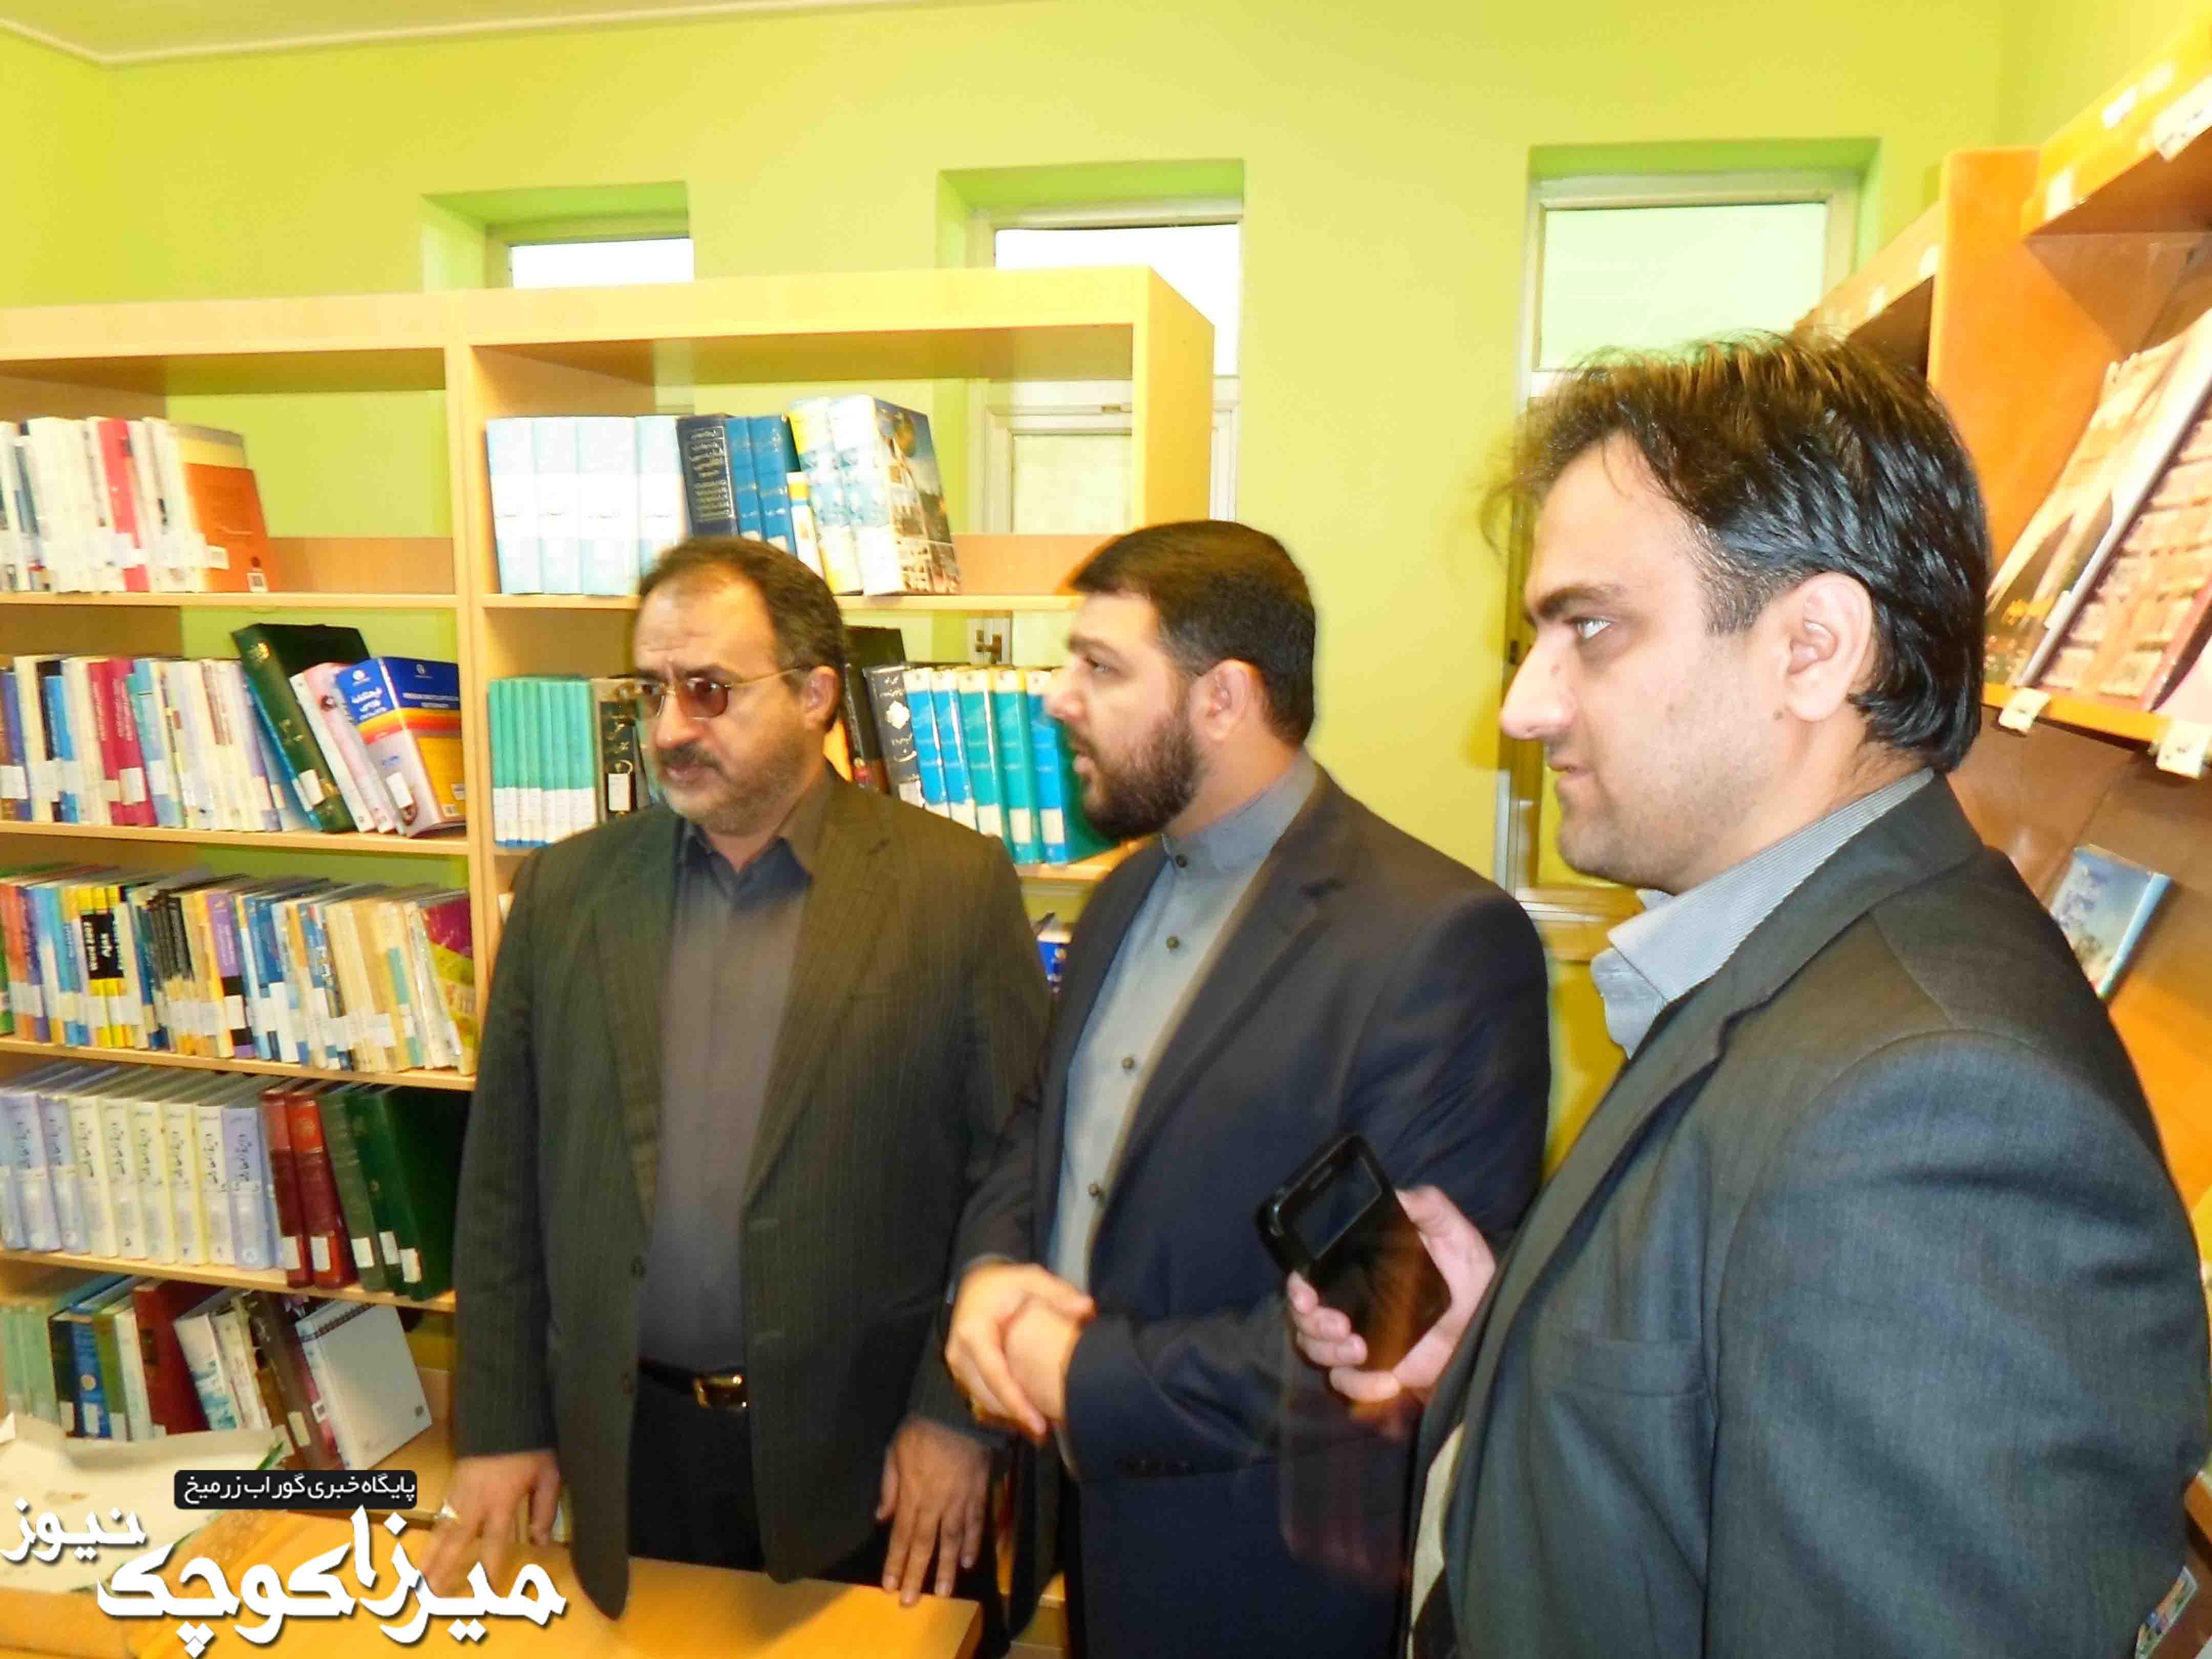 گزارش تصویری افتتاح بخش کودک کتابخانه گوراب زرمیخ